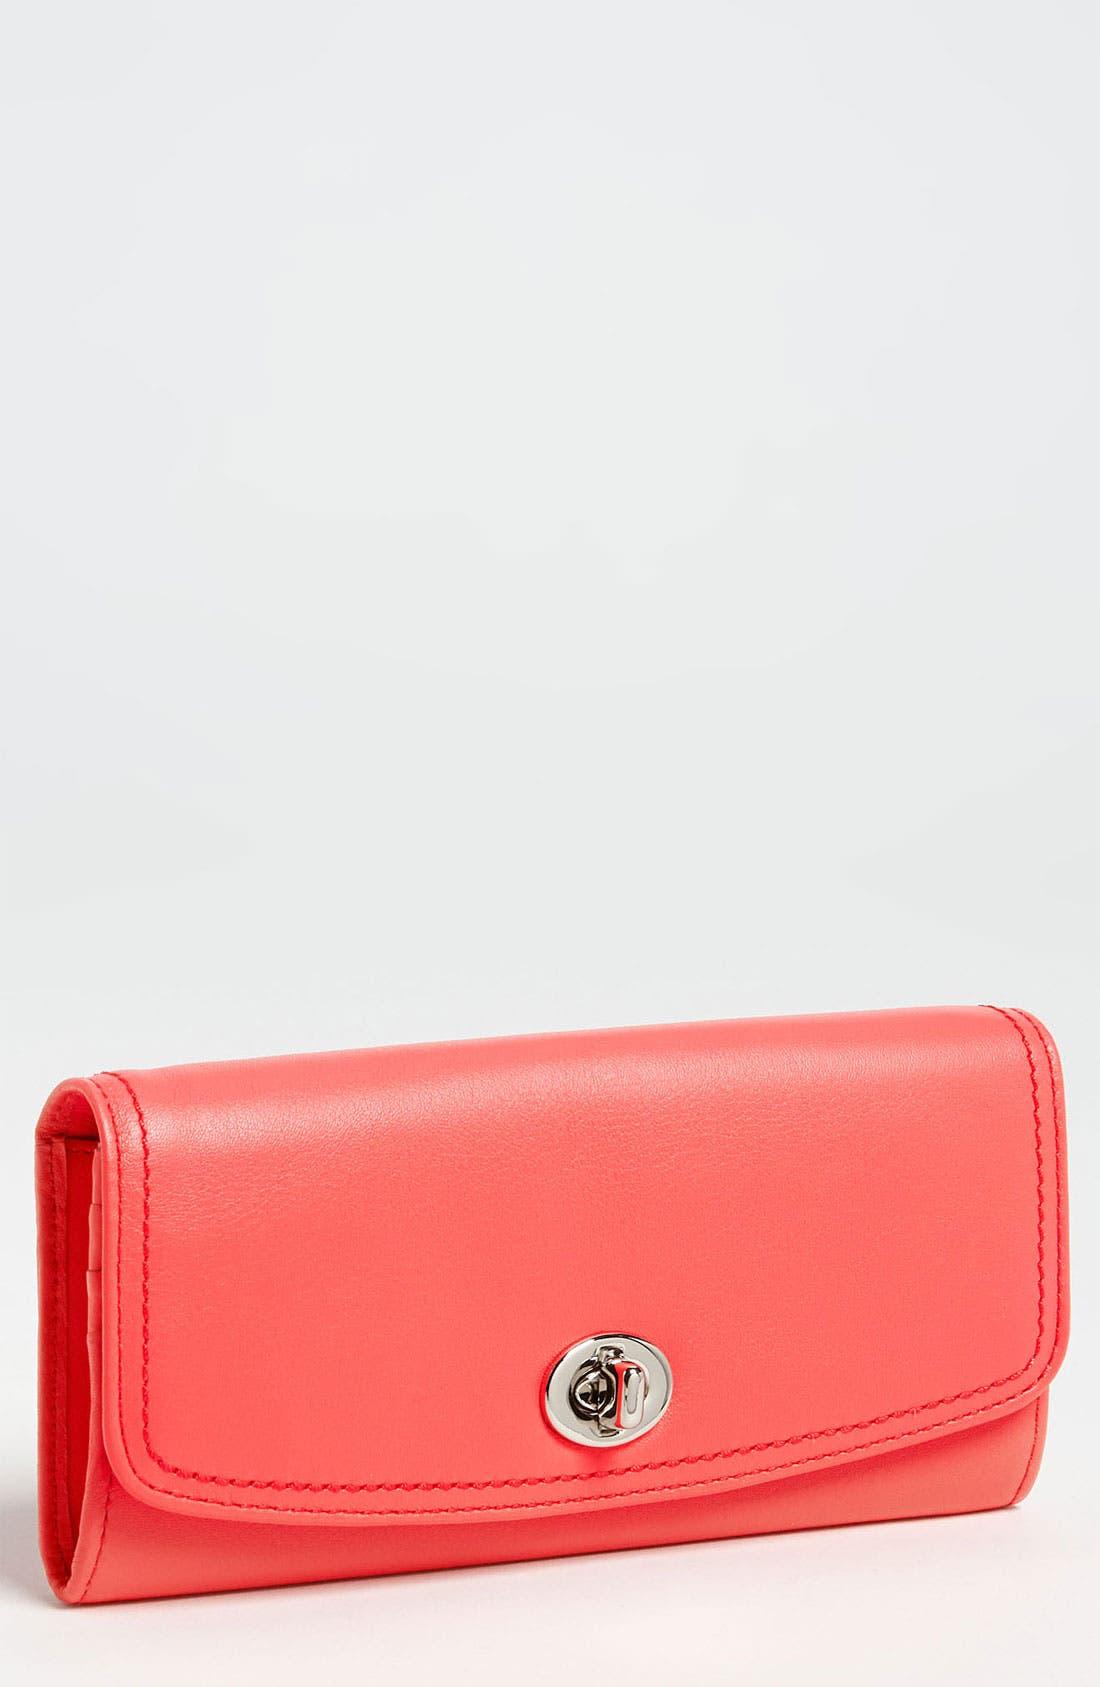 Alternate Image 1 Selected - COACH 'Legacy - Slim' Leather Envelope Wallet